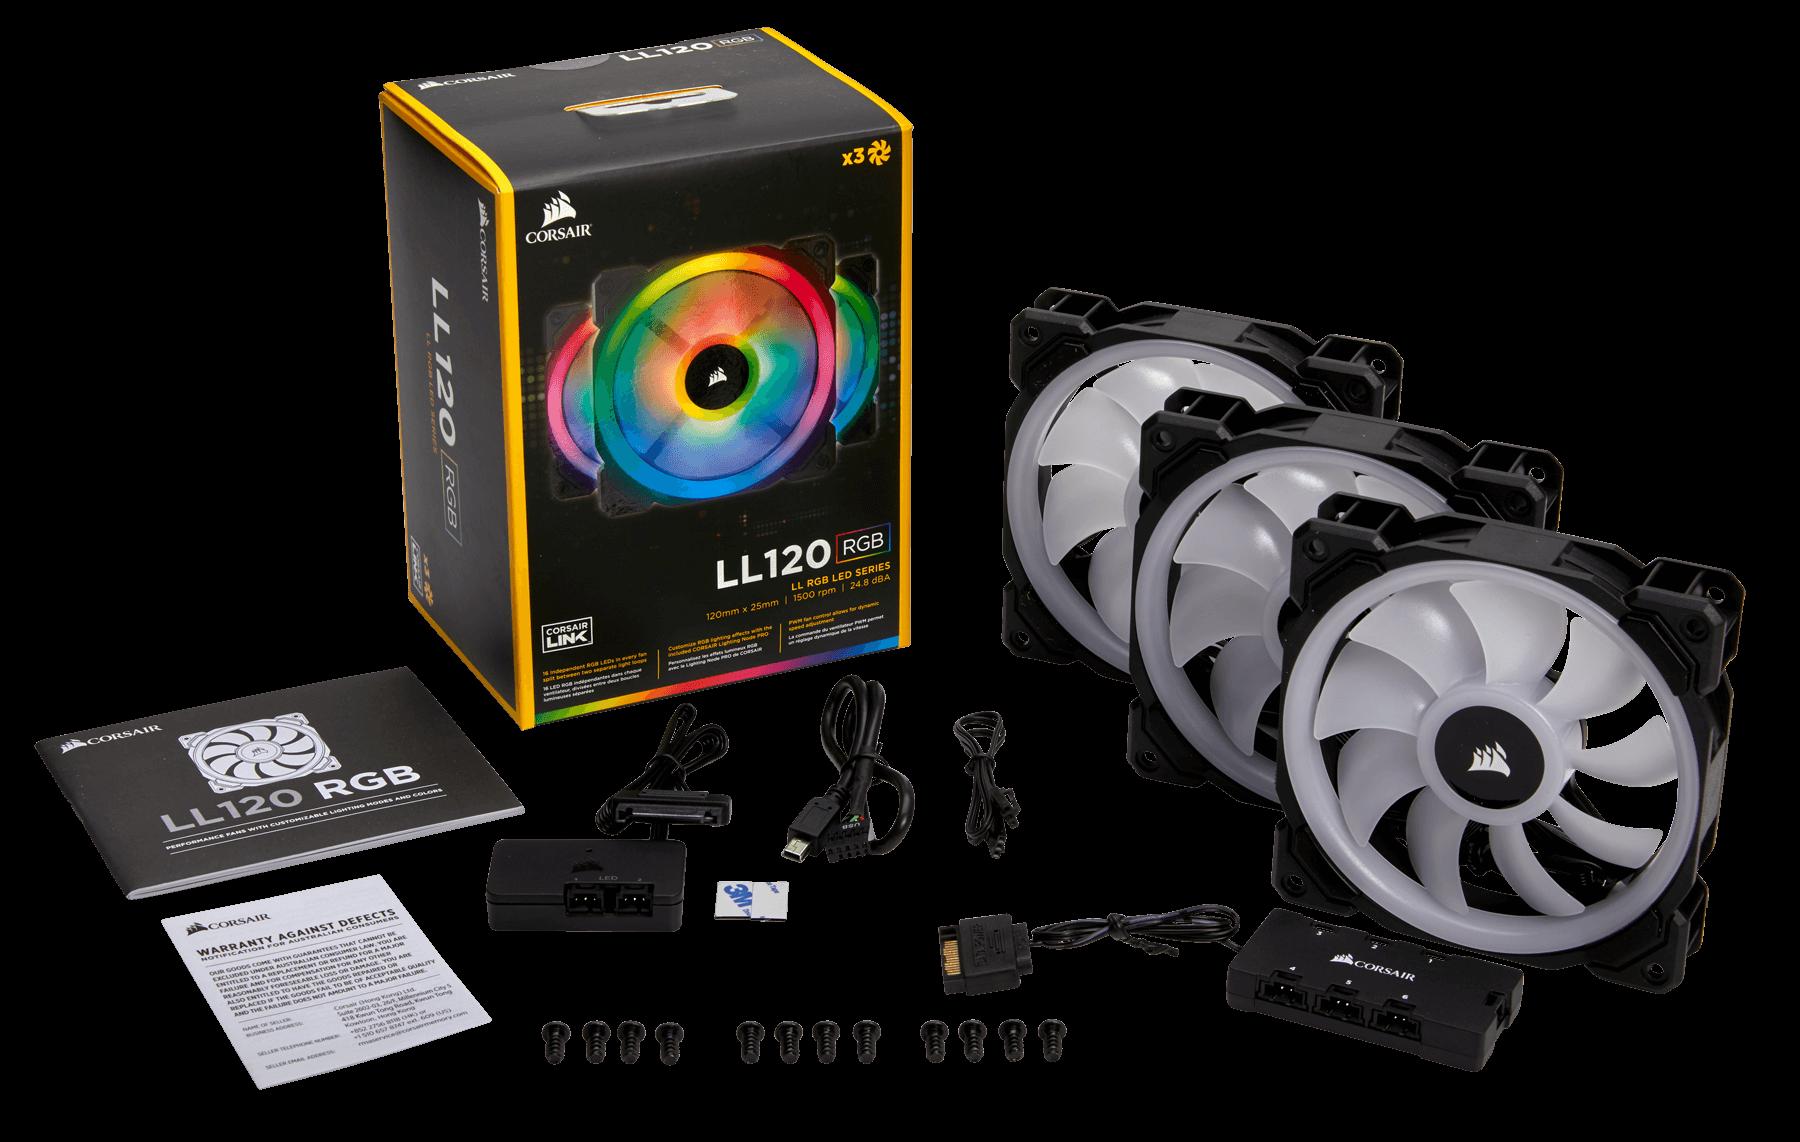 Fan Corsair LL120 RGB 120mm Dual Light Loop RGB LED PWM Fan (Gồm 3 Fan với Lighting Node PRO) (CO-9050072-WW)